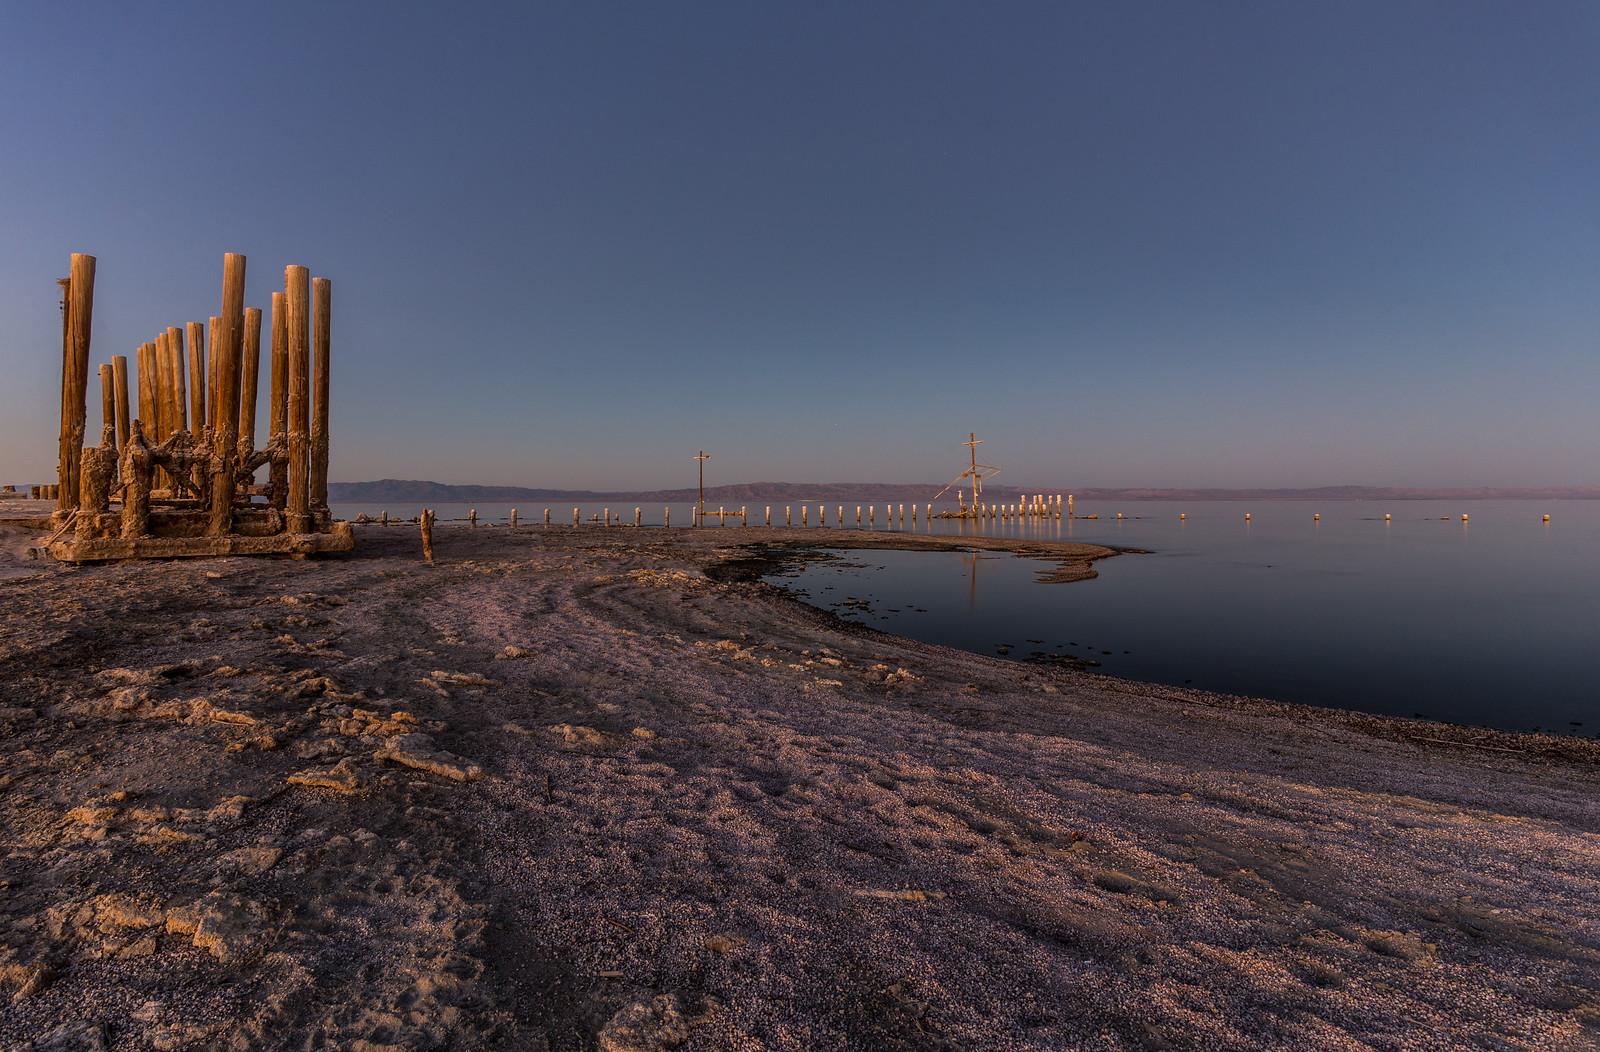 Crusty Shore of the Salton Sea